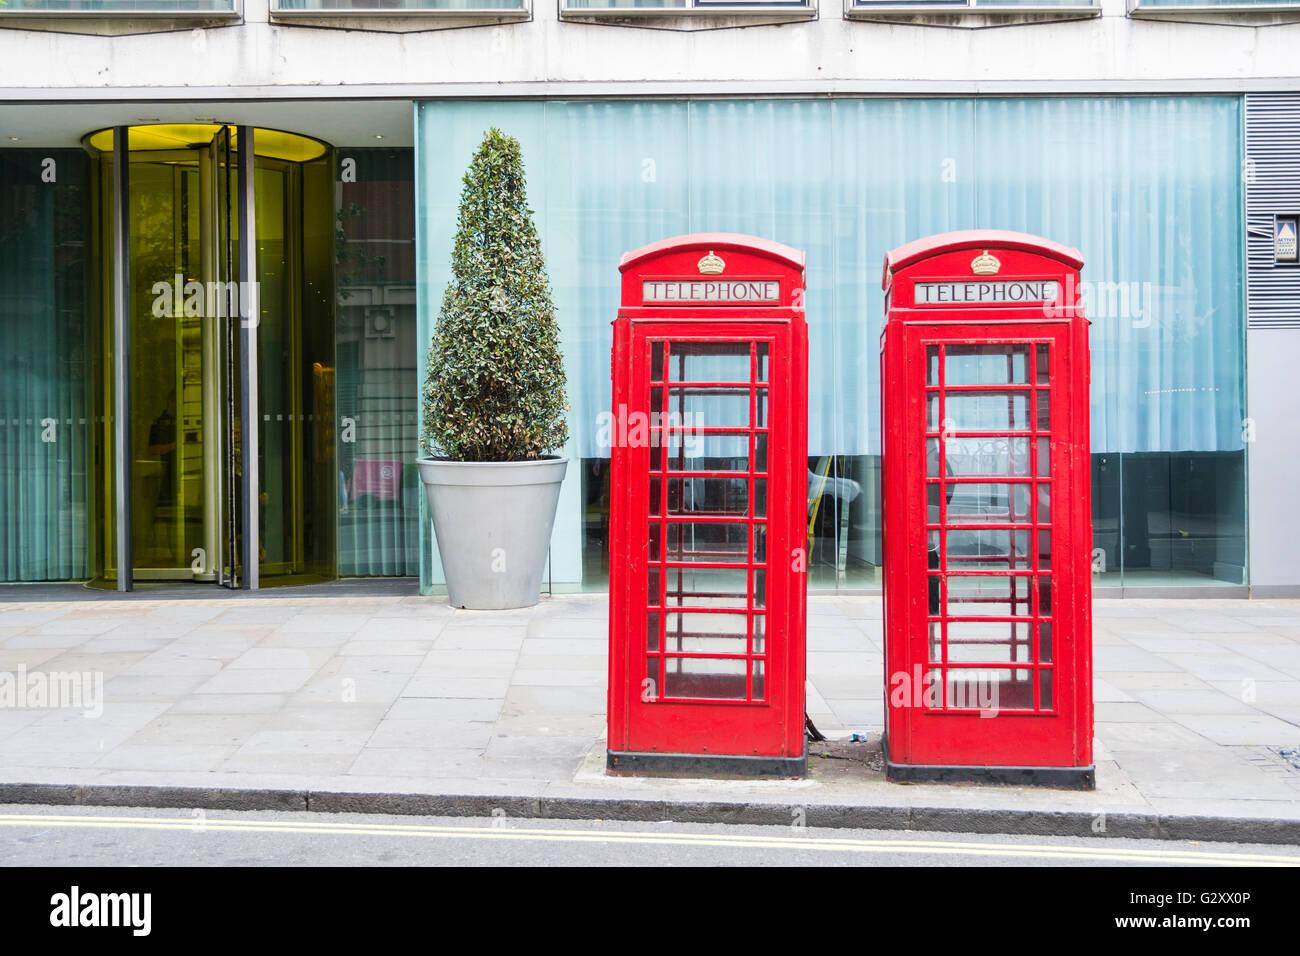 Two bright red K6 London telephone kiosks on London's St Martins Lane. - Stock Image